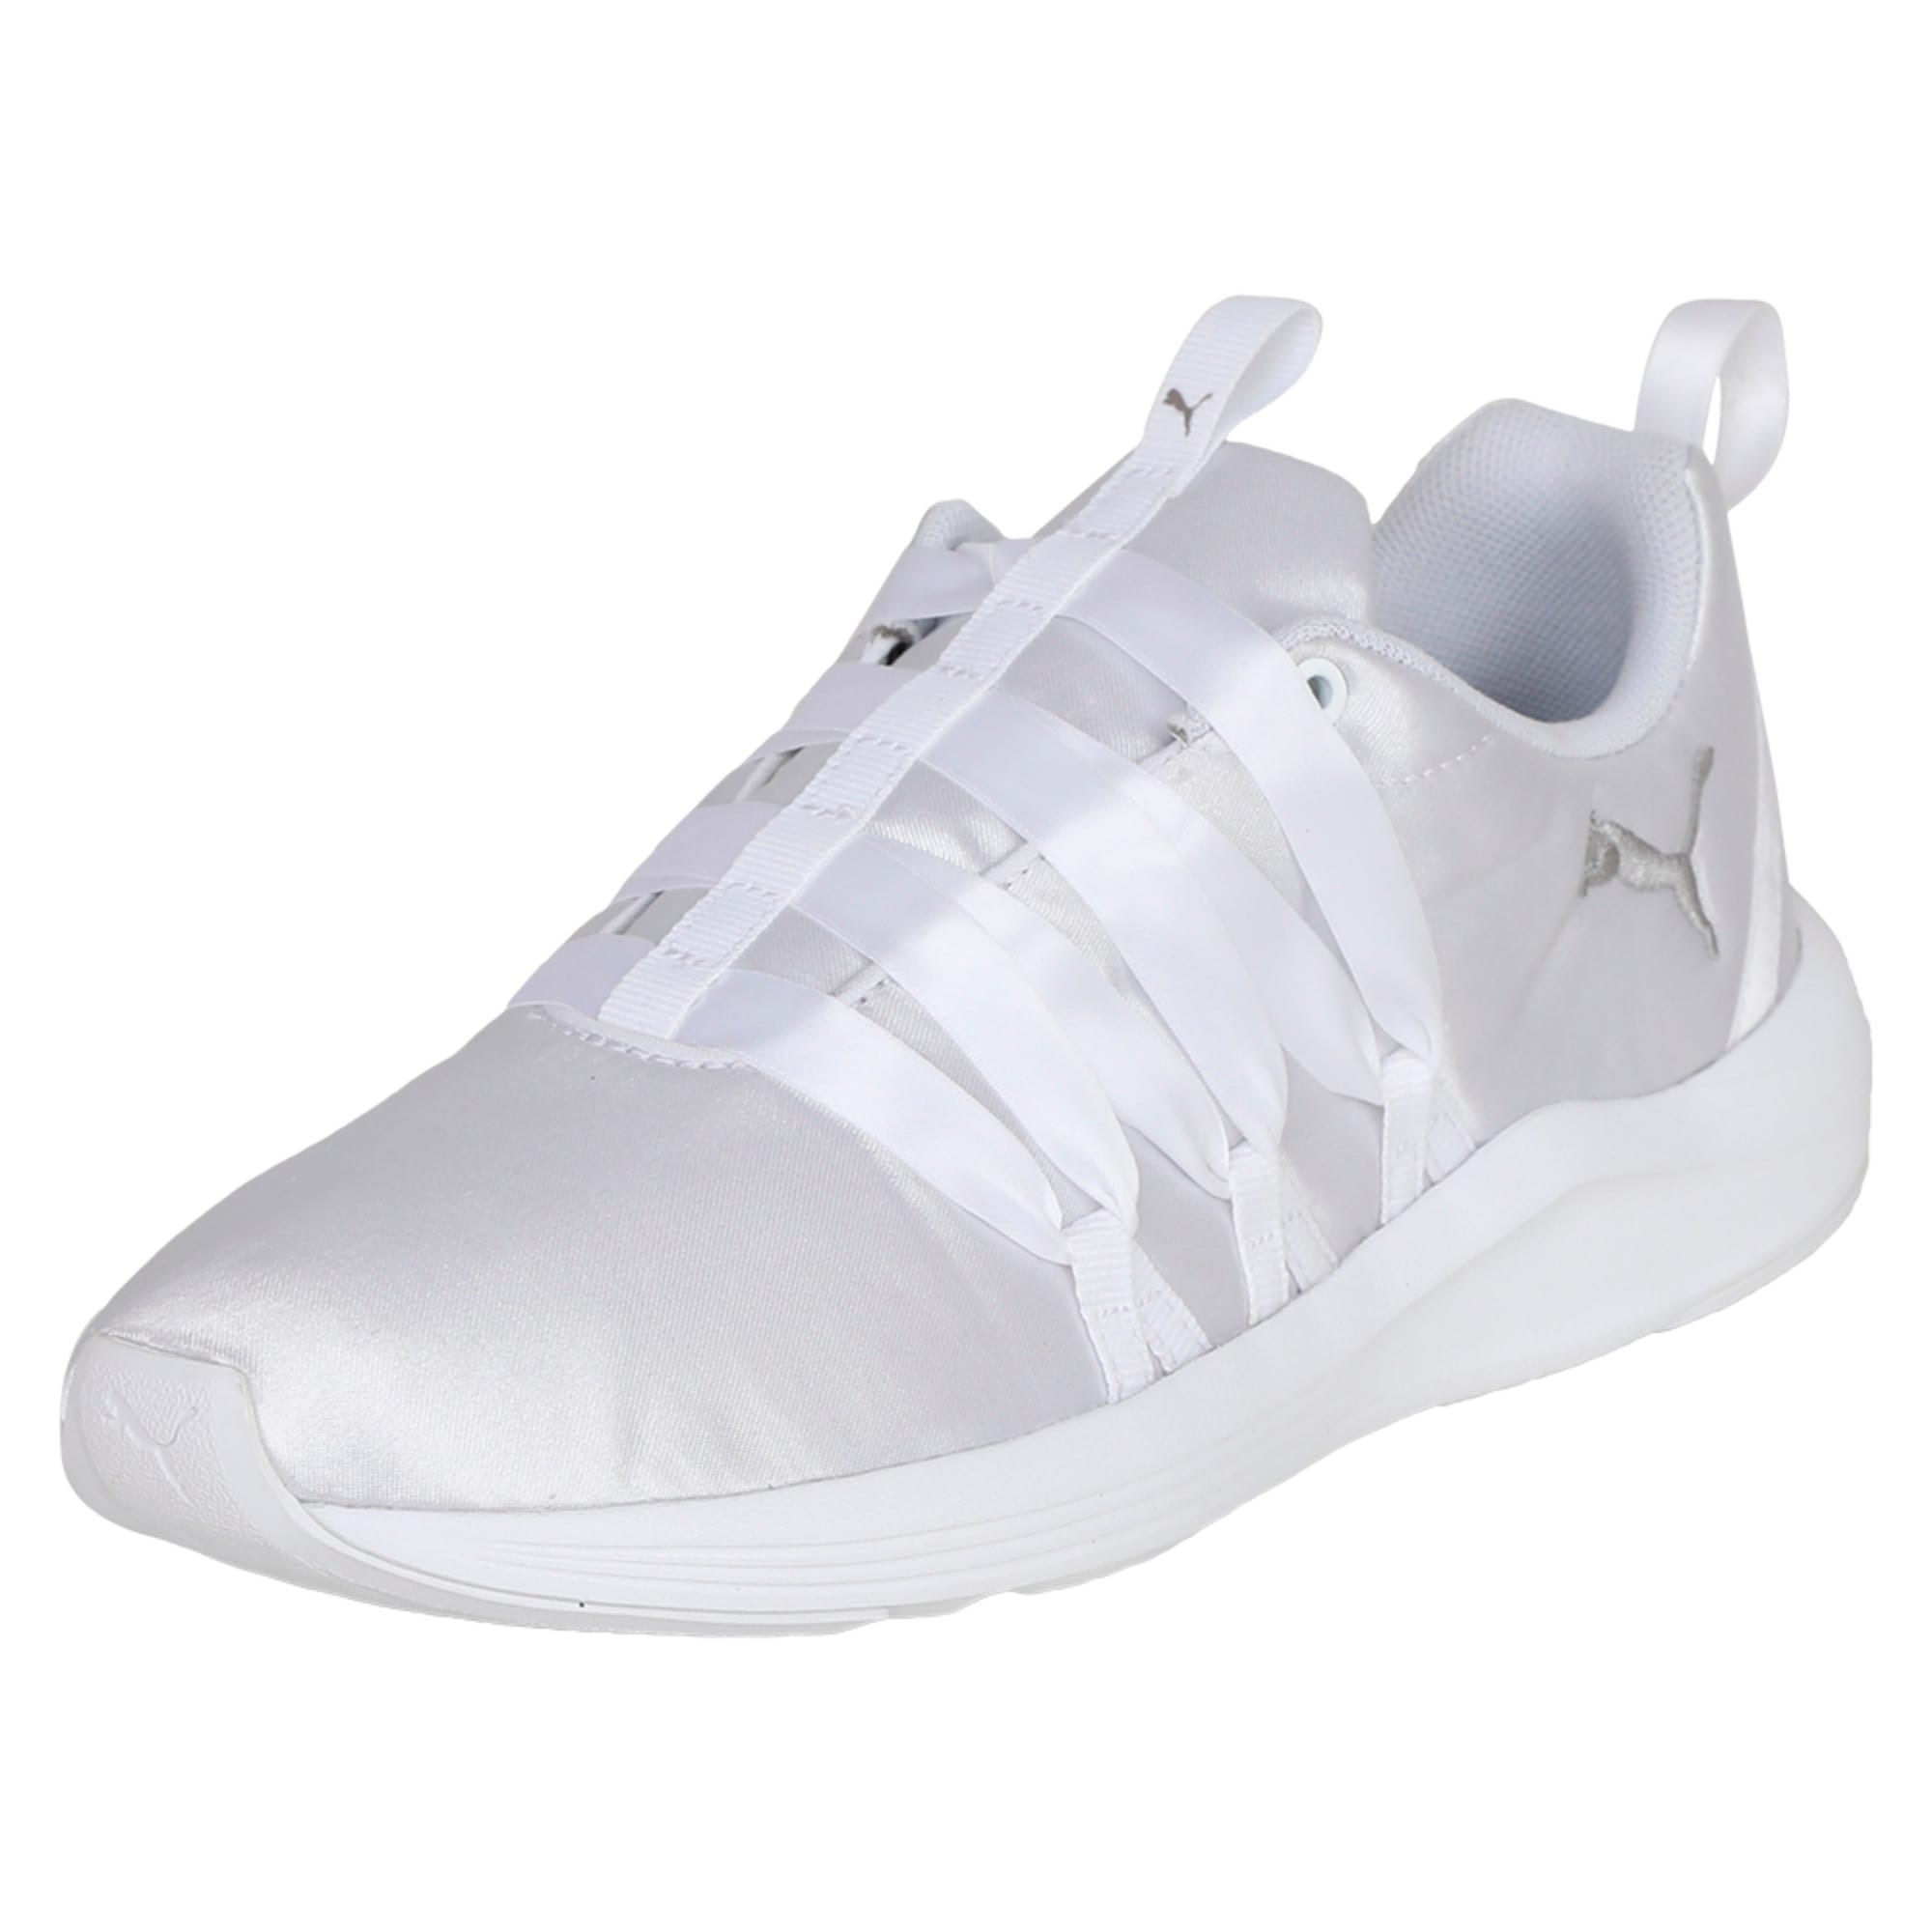 Thumbnail 1 of Prowl Alt Satin Women's Training Shoes, Puma White, medium-IND